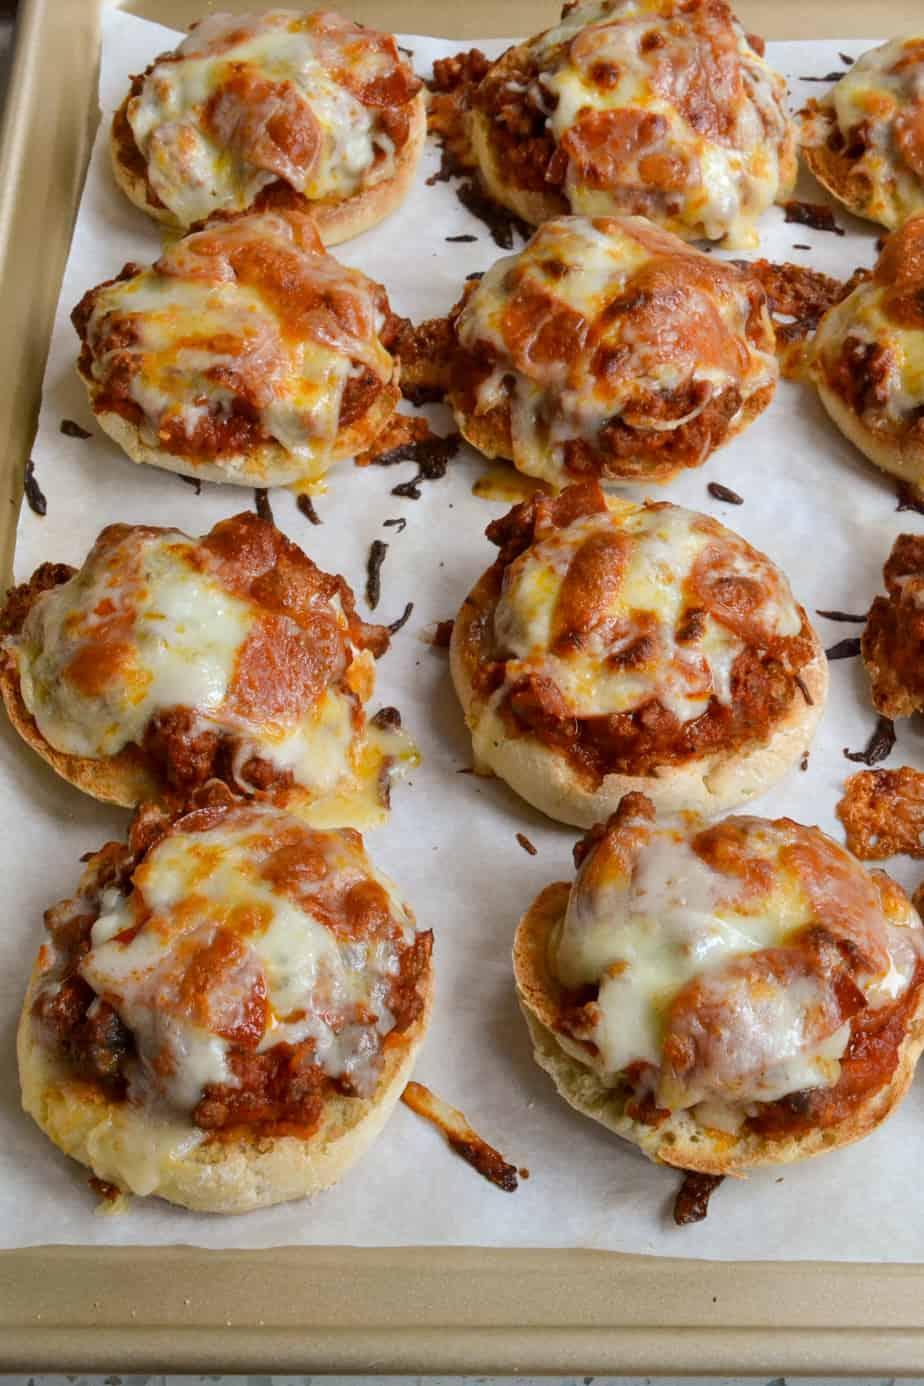 English muffins topped with browned hamburger, onions, marinara, and cheese.